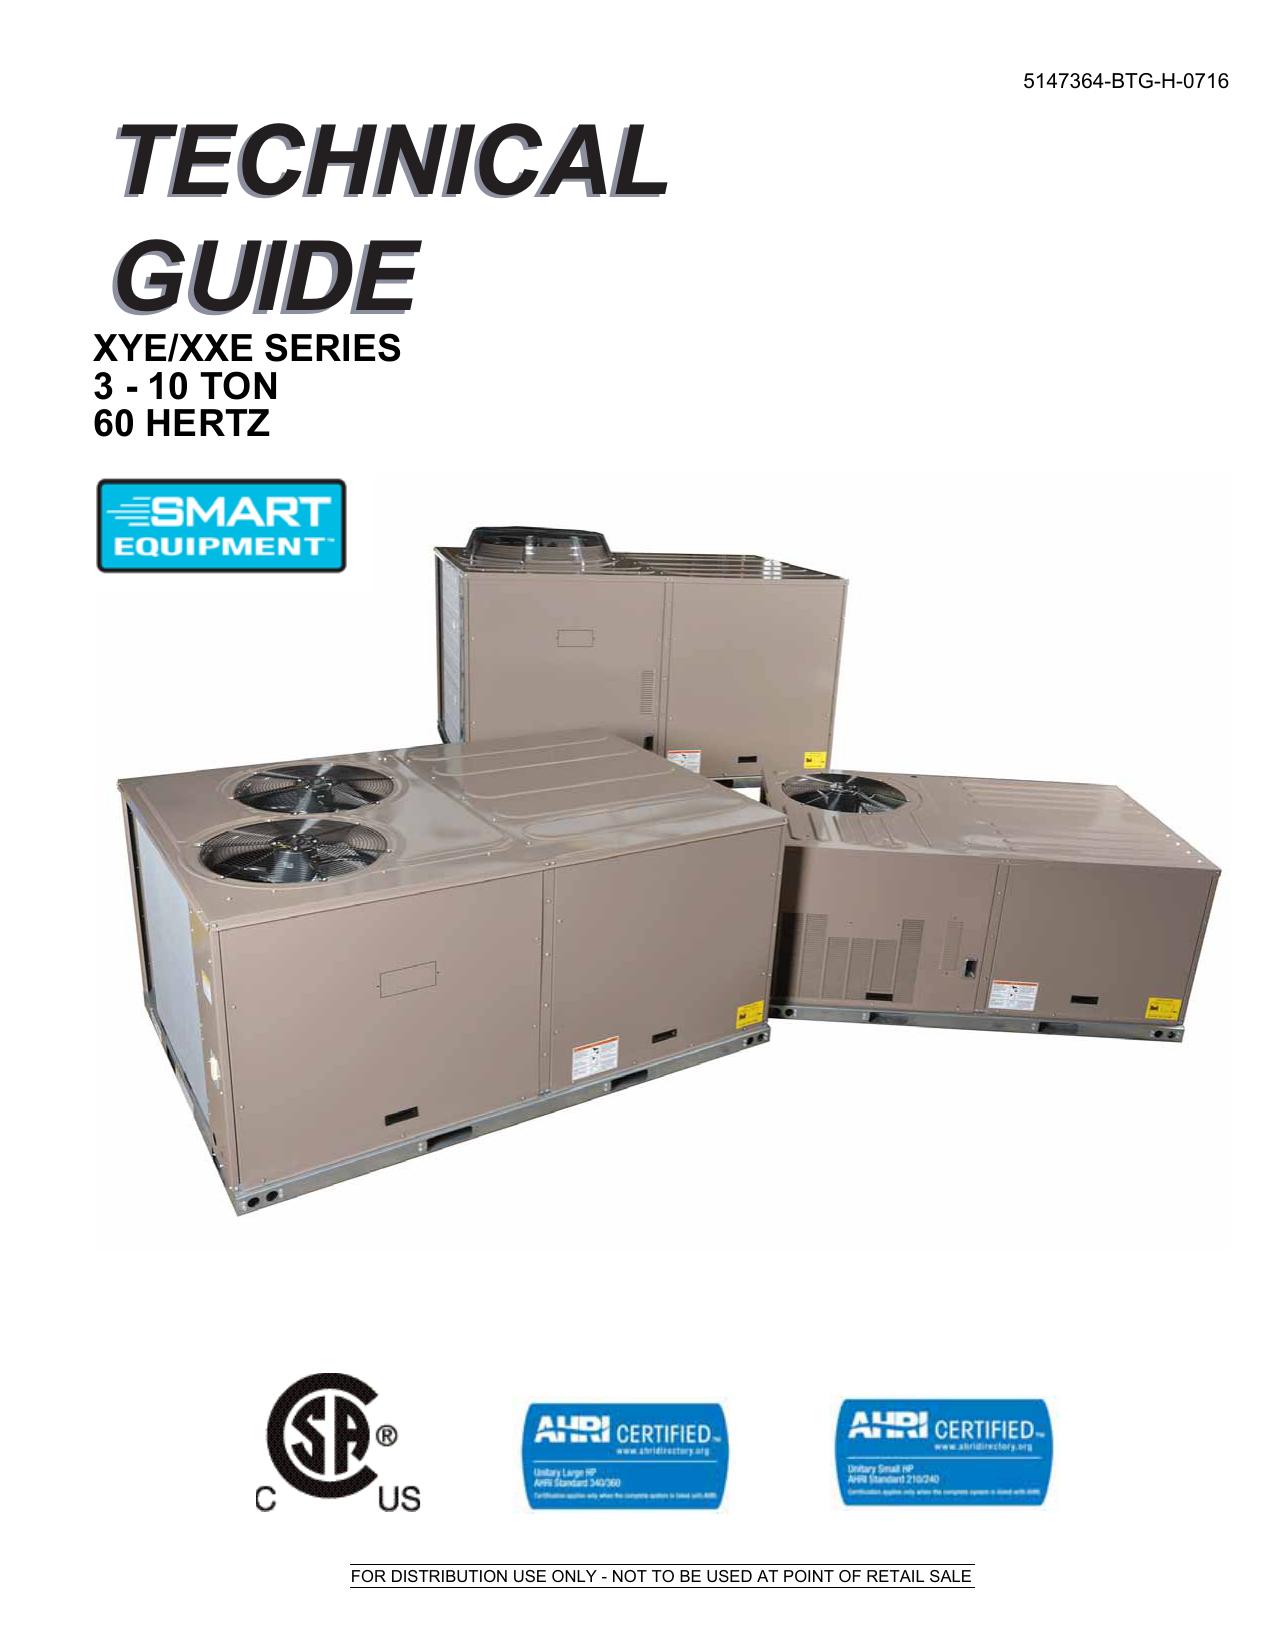 Technical Guide | manualzz.com on